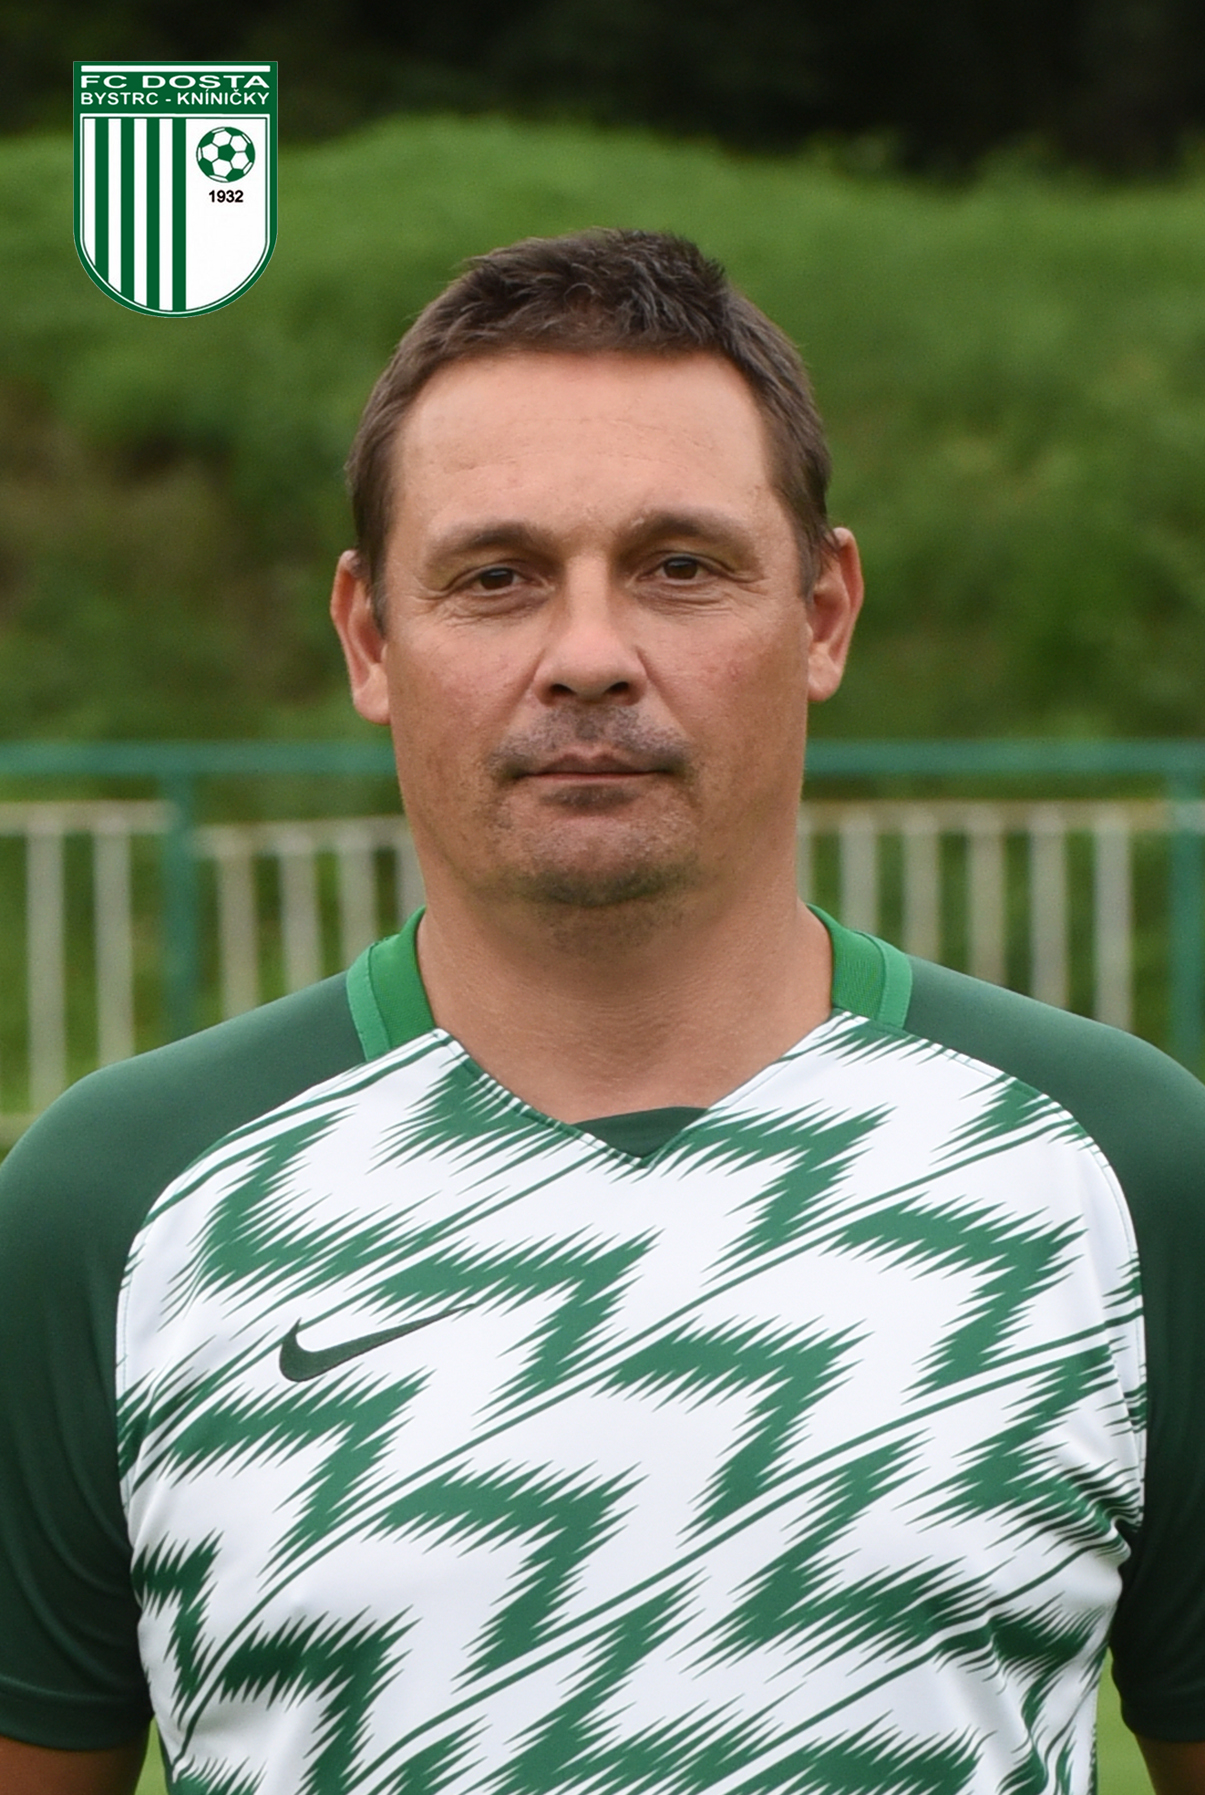 Pavel Srb